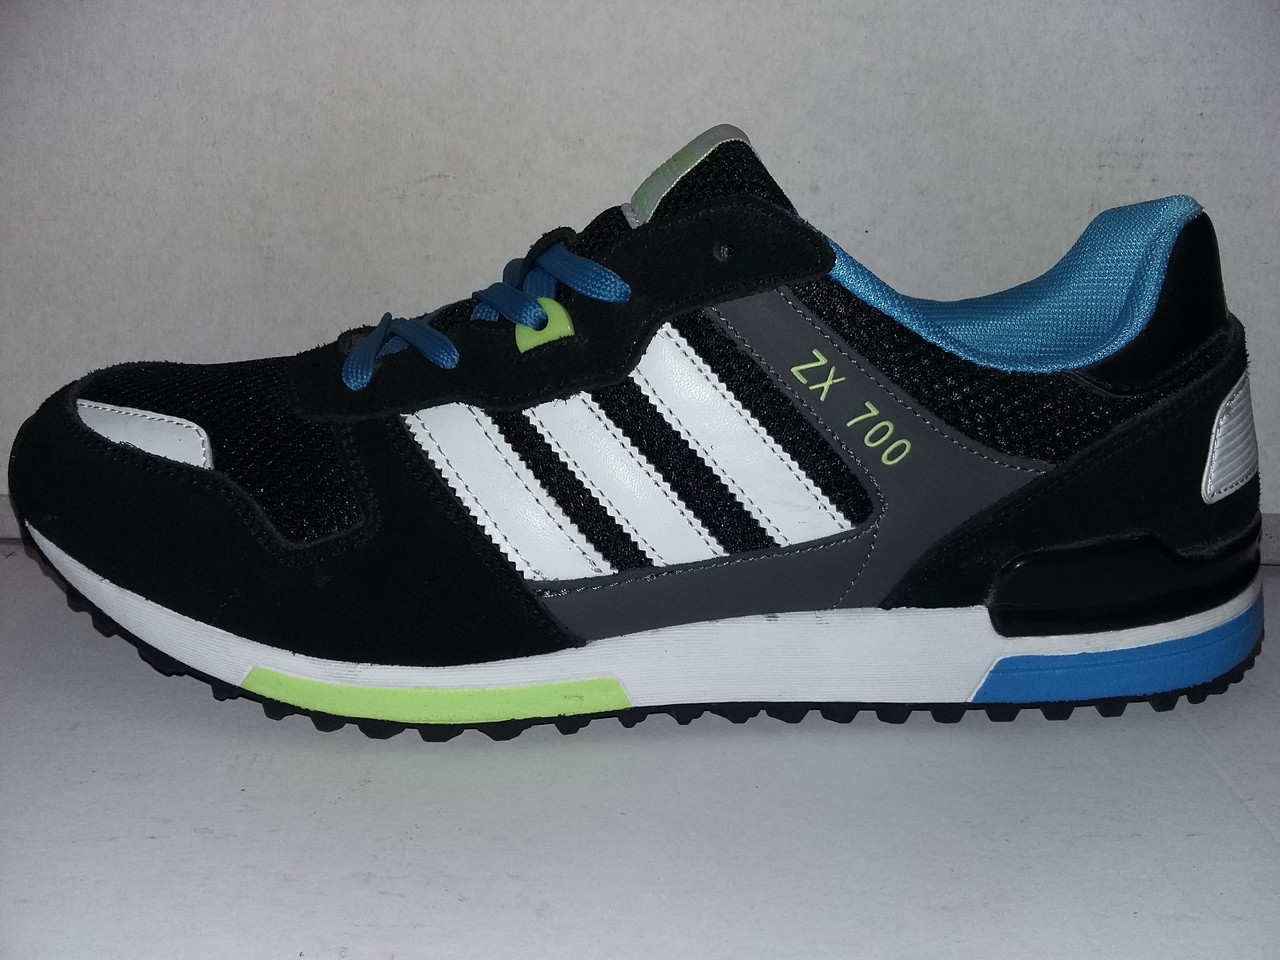 2fbbc67f2 ... Летние кроссовки Adidas ZX 700 46 ...